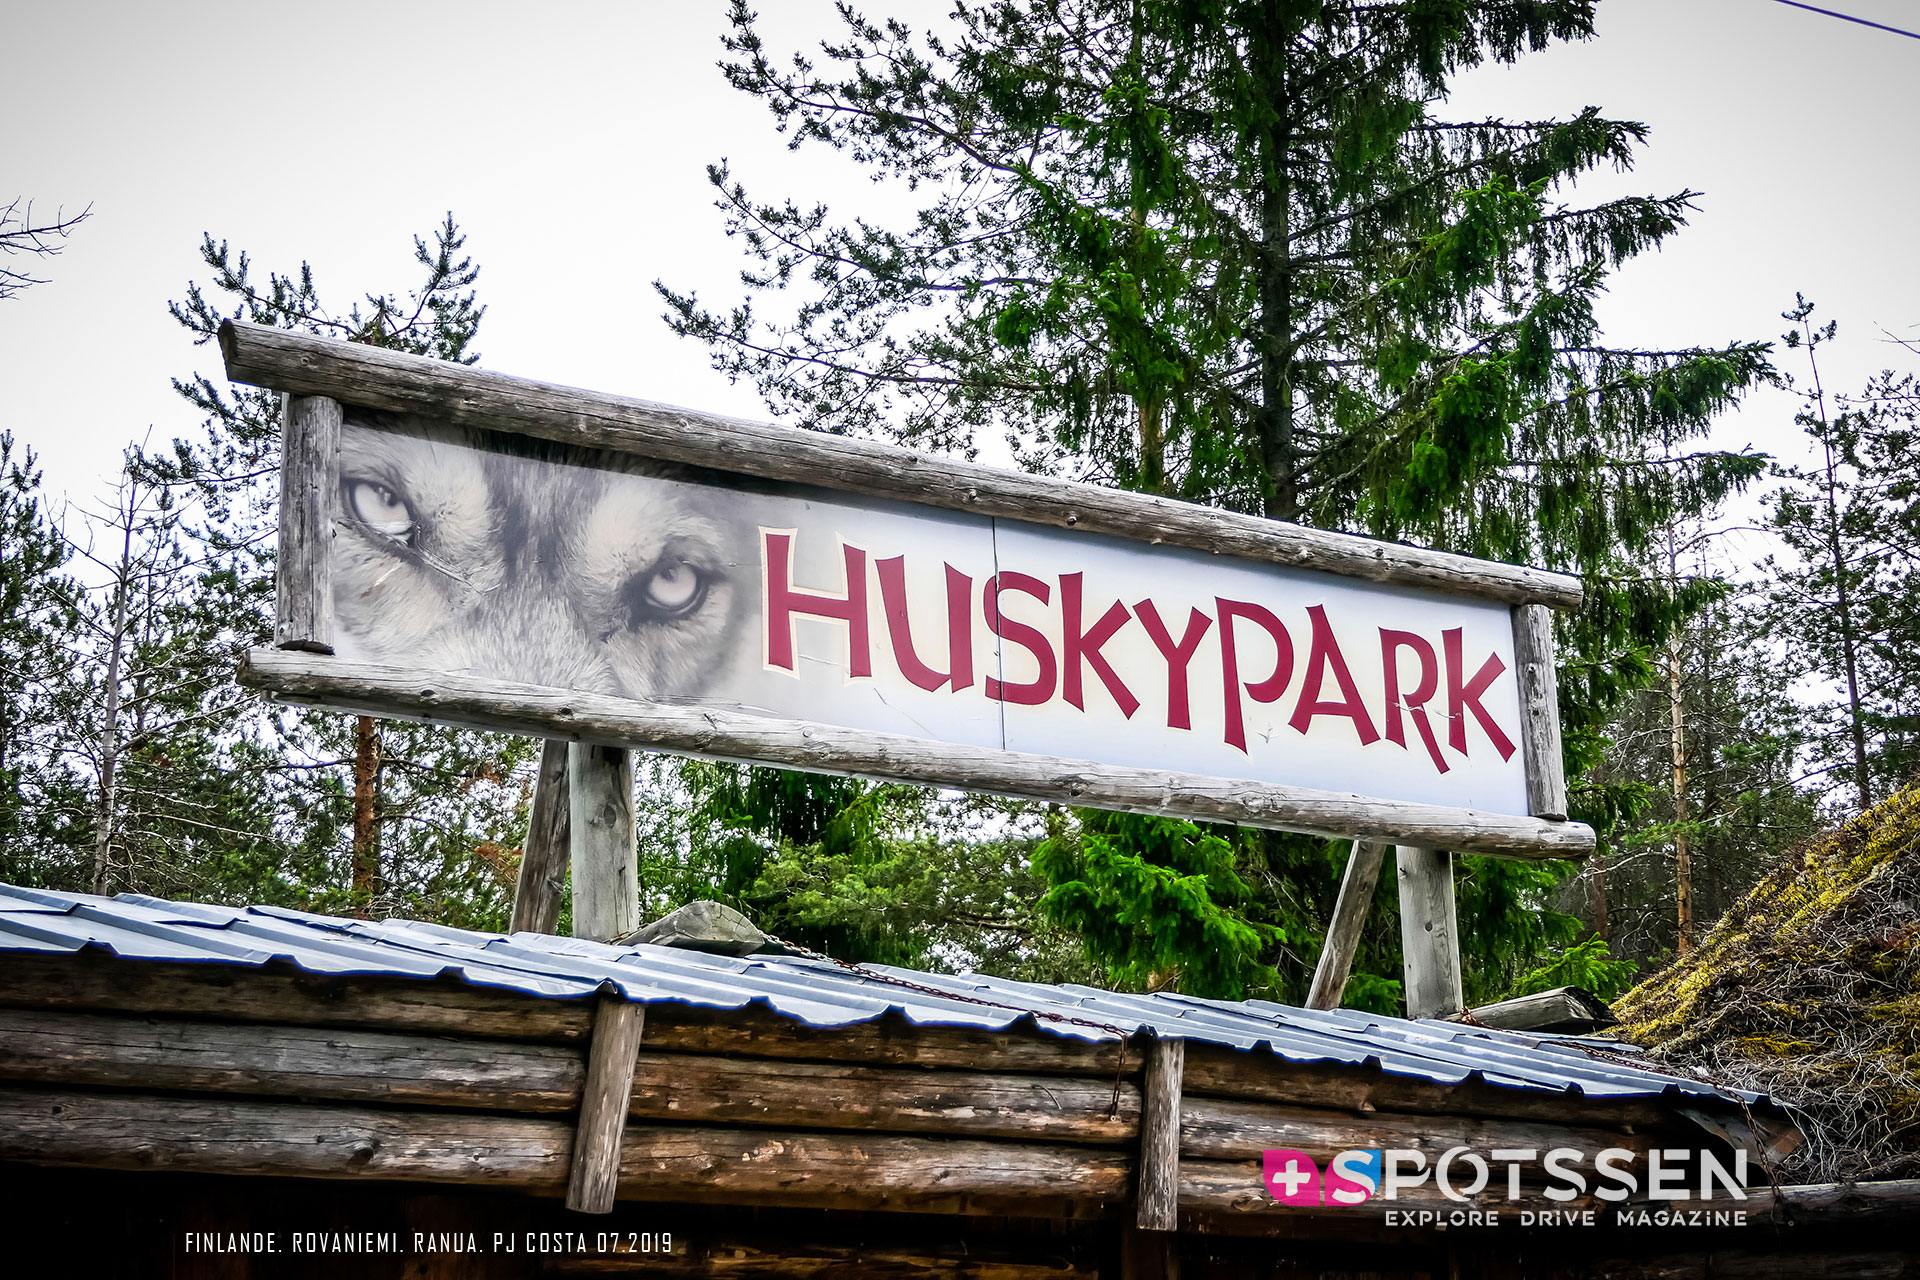 2019, rovaniemi, finlande, husky park